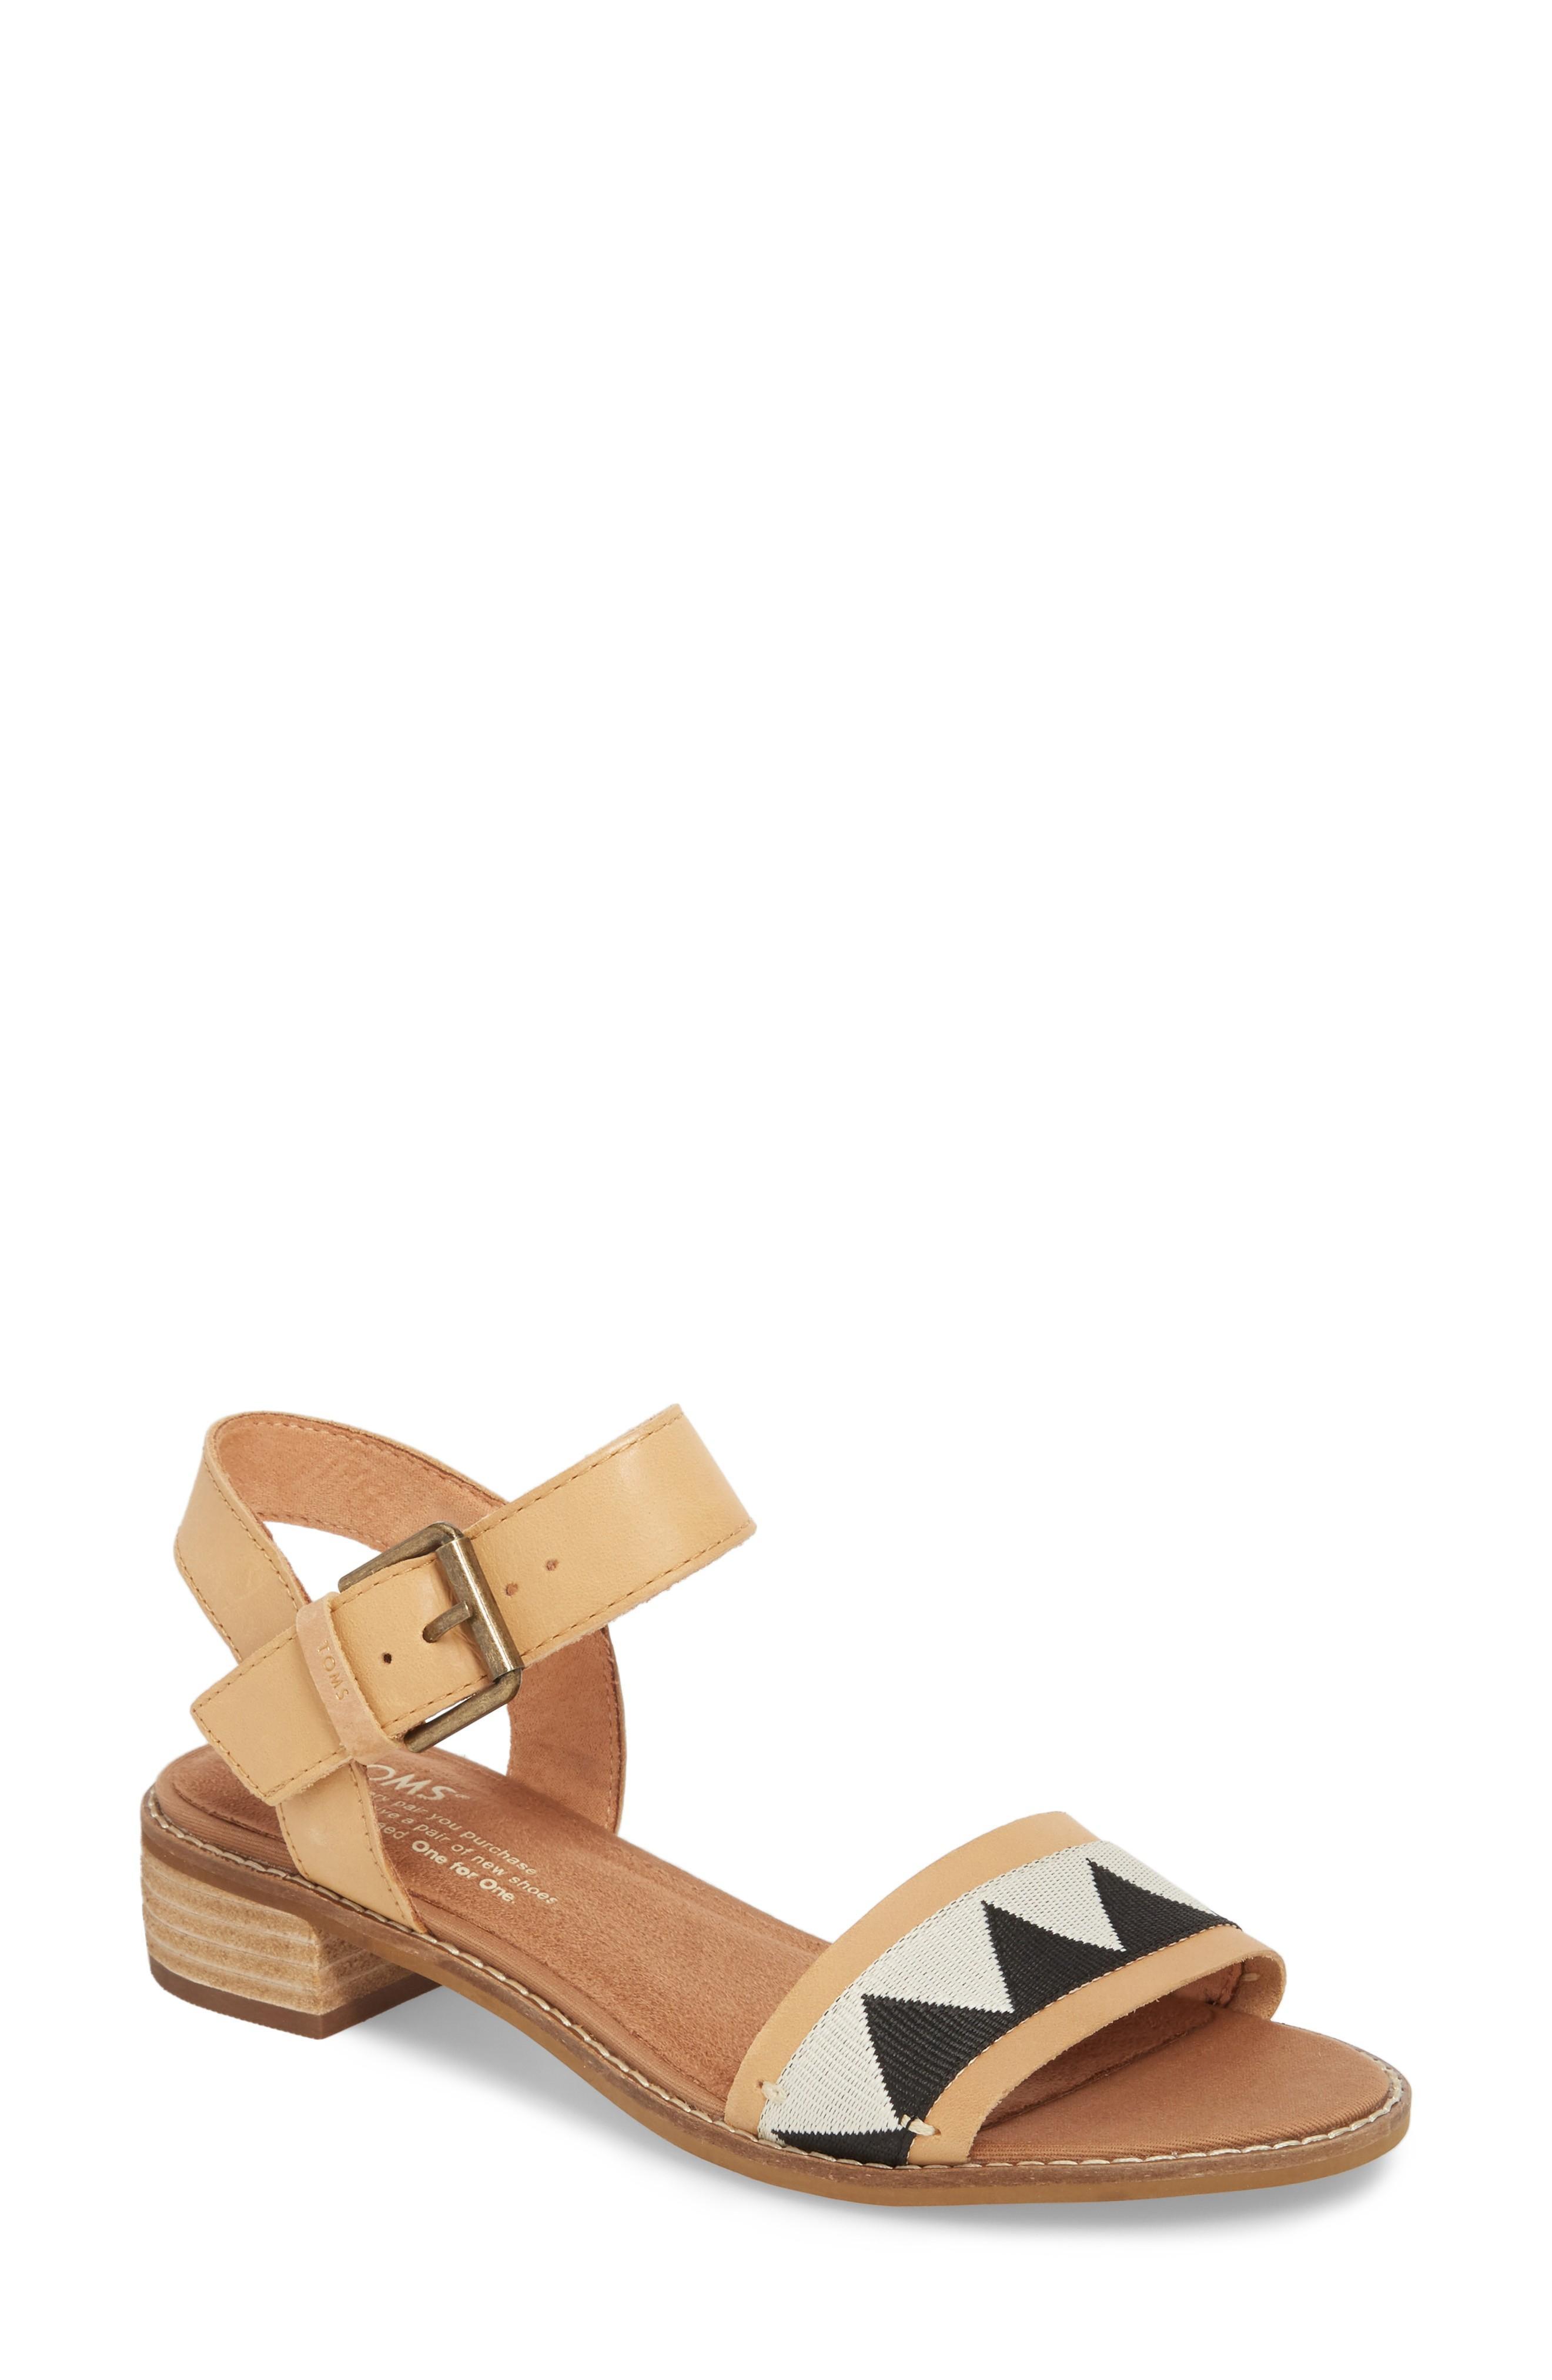 68f14ae3160 Toms Camilia Sandal In Honey Leather  Black Tribal